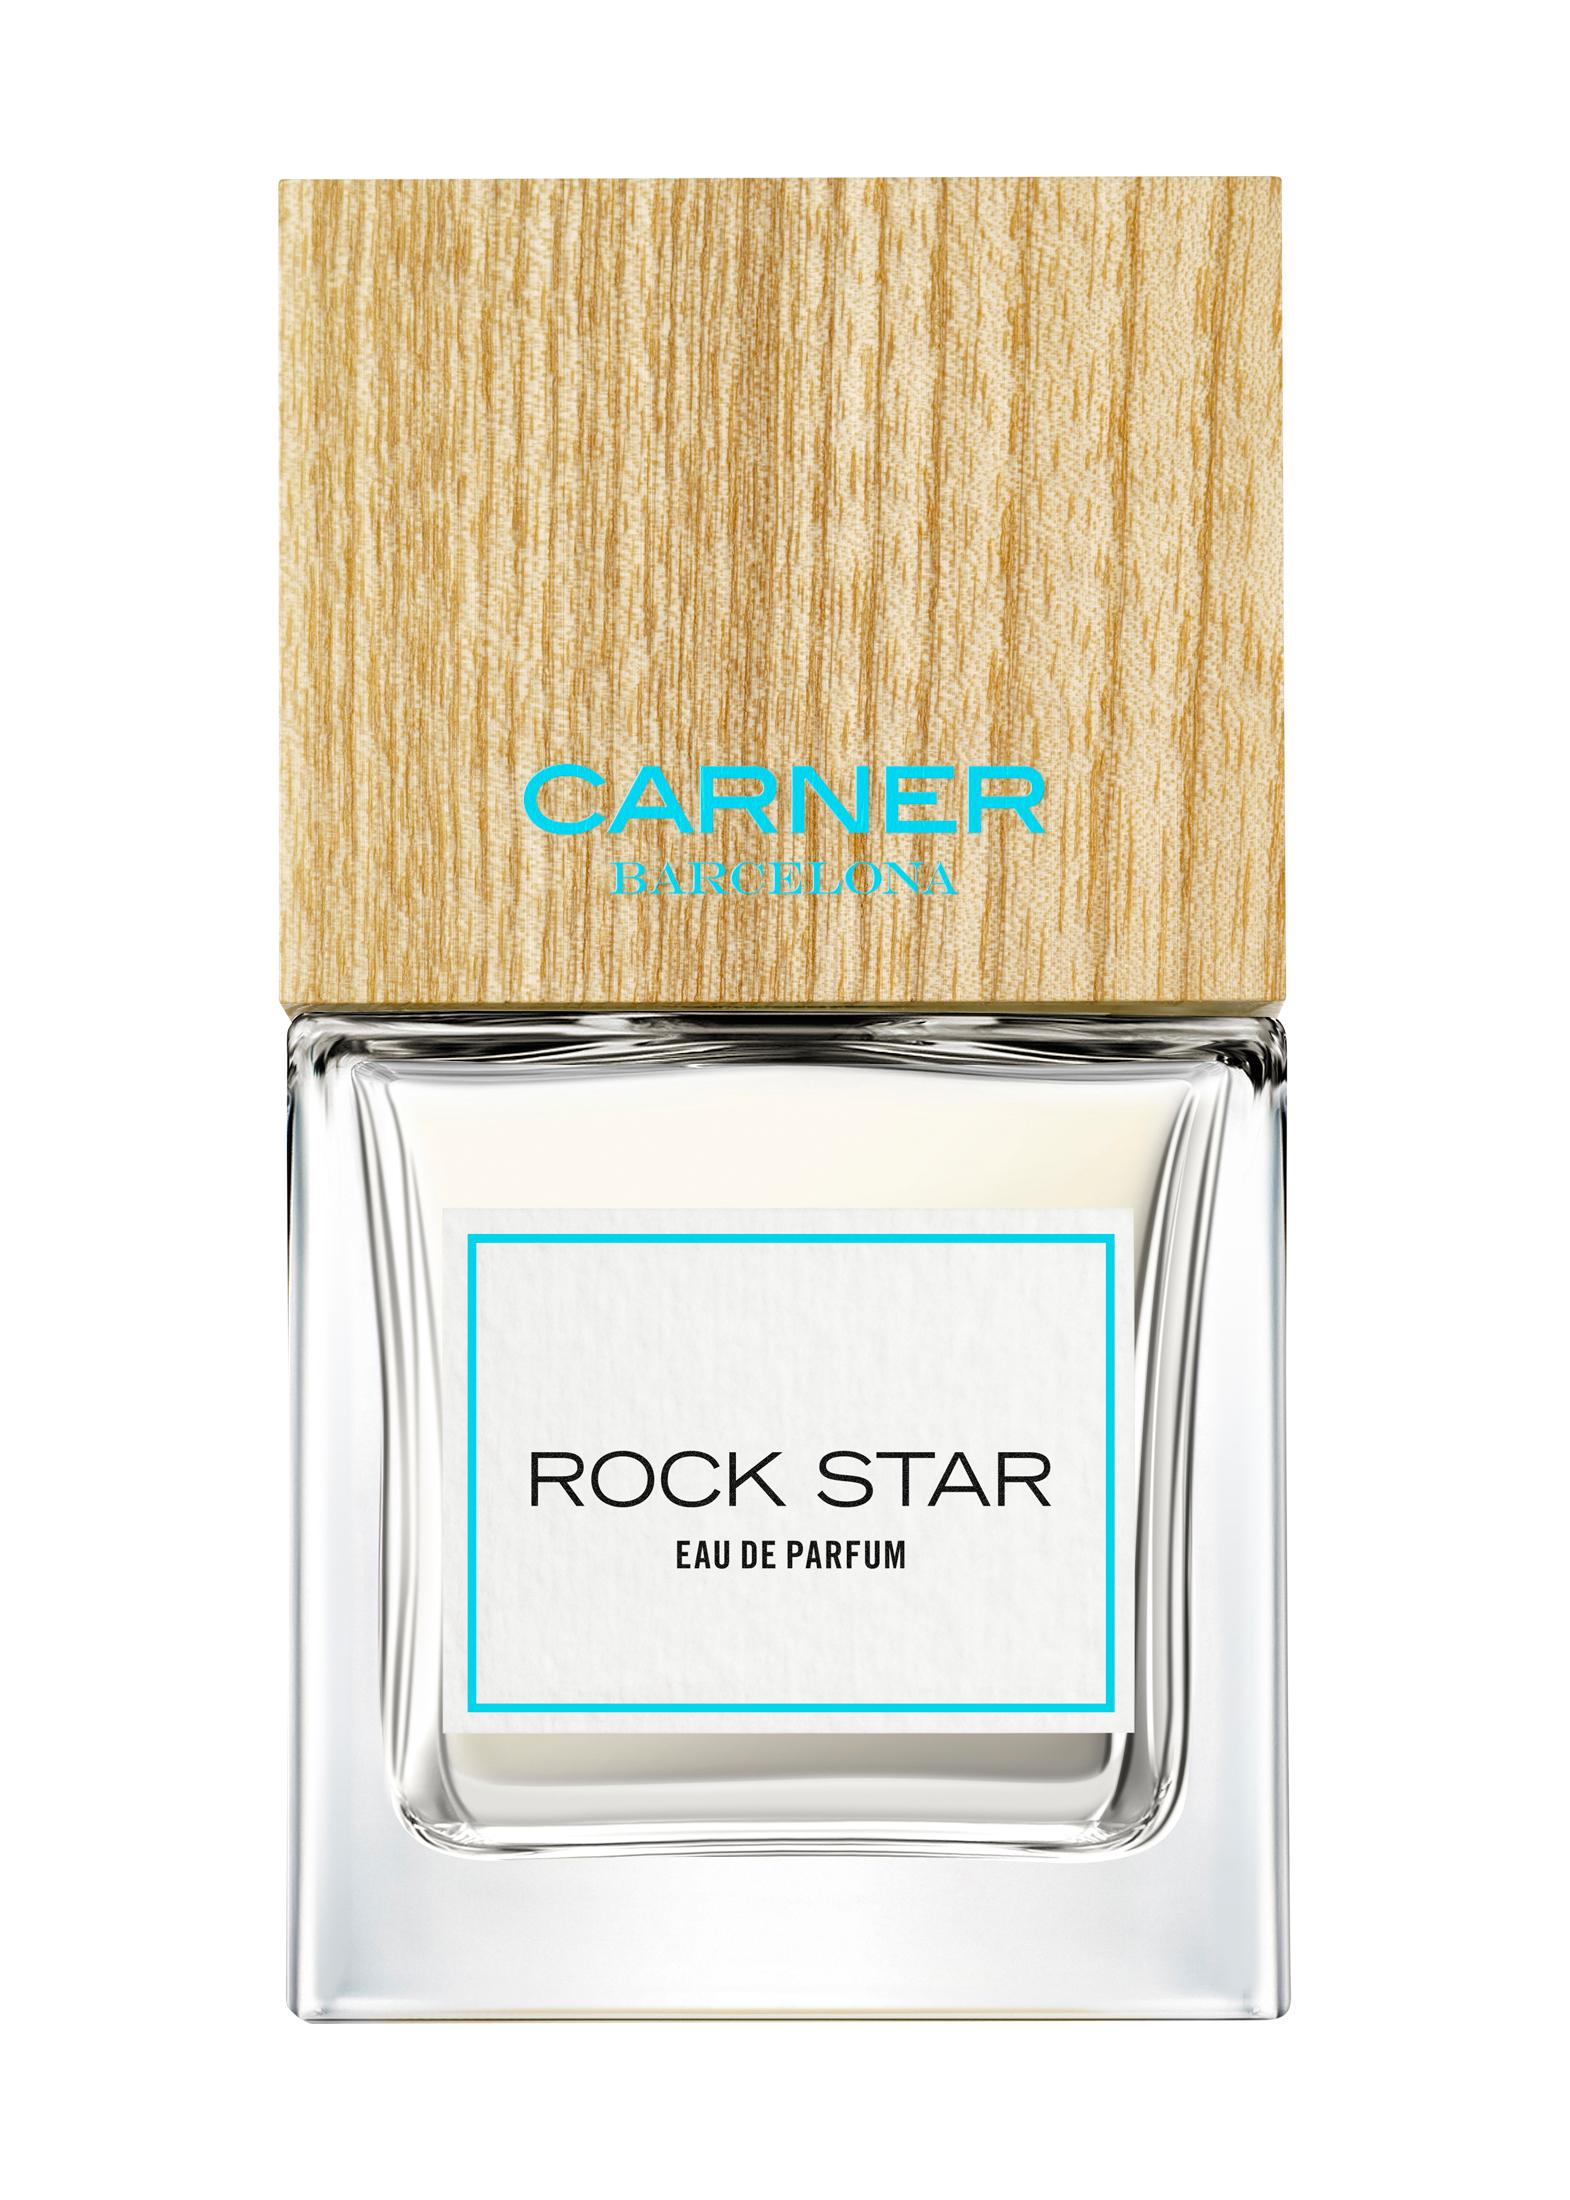 ROCK STAR 50ml image number 0